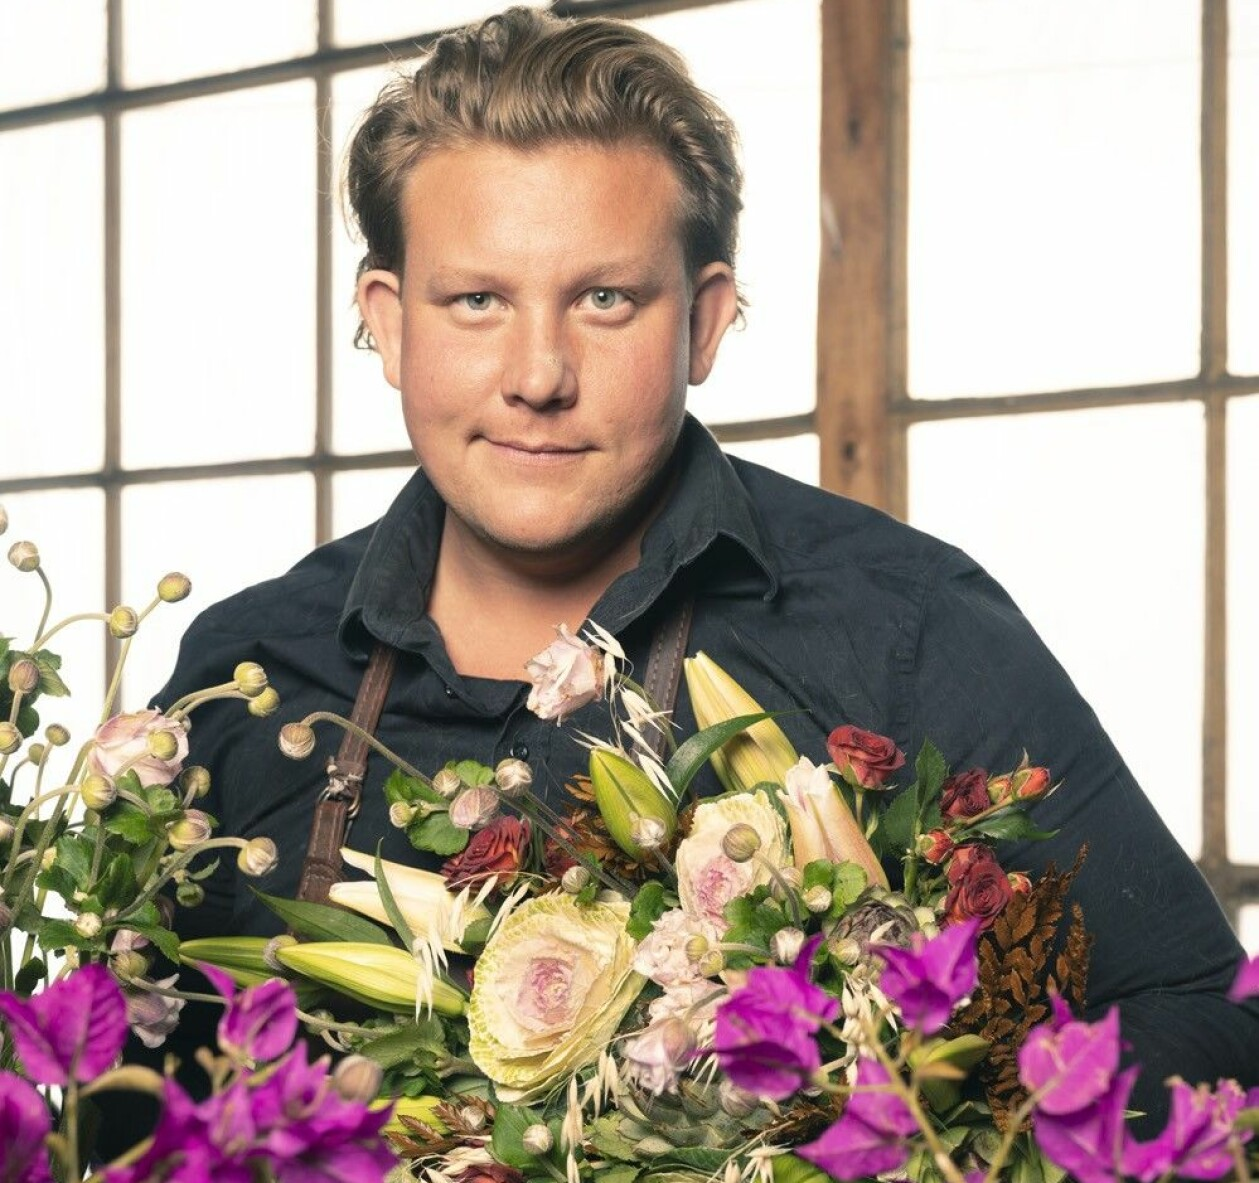 Porträtt av Karl Fredrik med ett fint blomsterarrangemang i famnen.